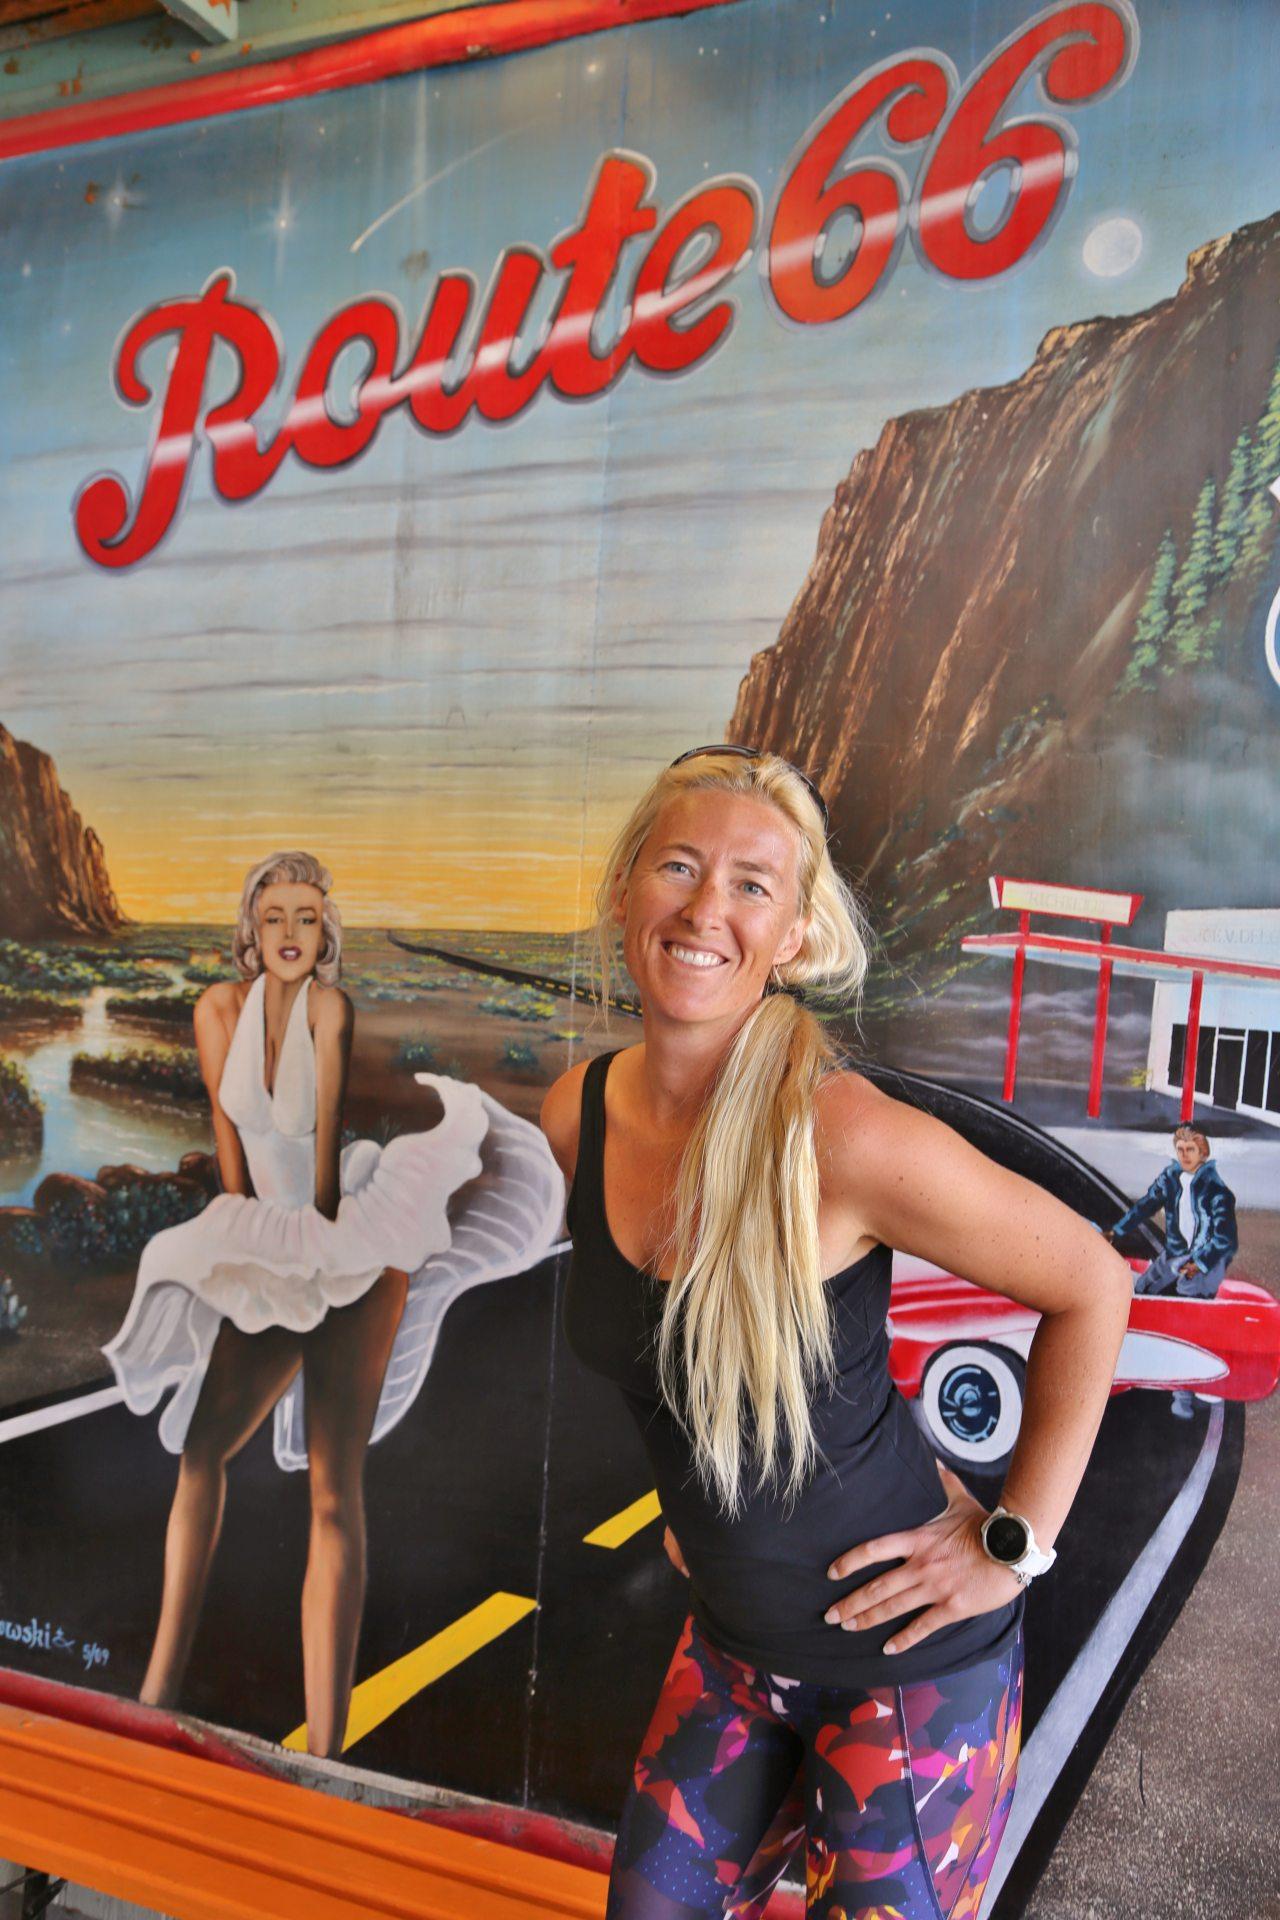 Die Marylin kriegts doch besser hin! - Arizona, Blondine, Marilyn Monroe, Personen, Plakat, Portrait, Porträt, Poster, Route 66, Seligman - HOFBAUER-HOFMANN Sofia - (Seligman, Arizona, Vereinigte Staaten)